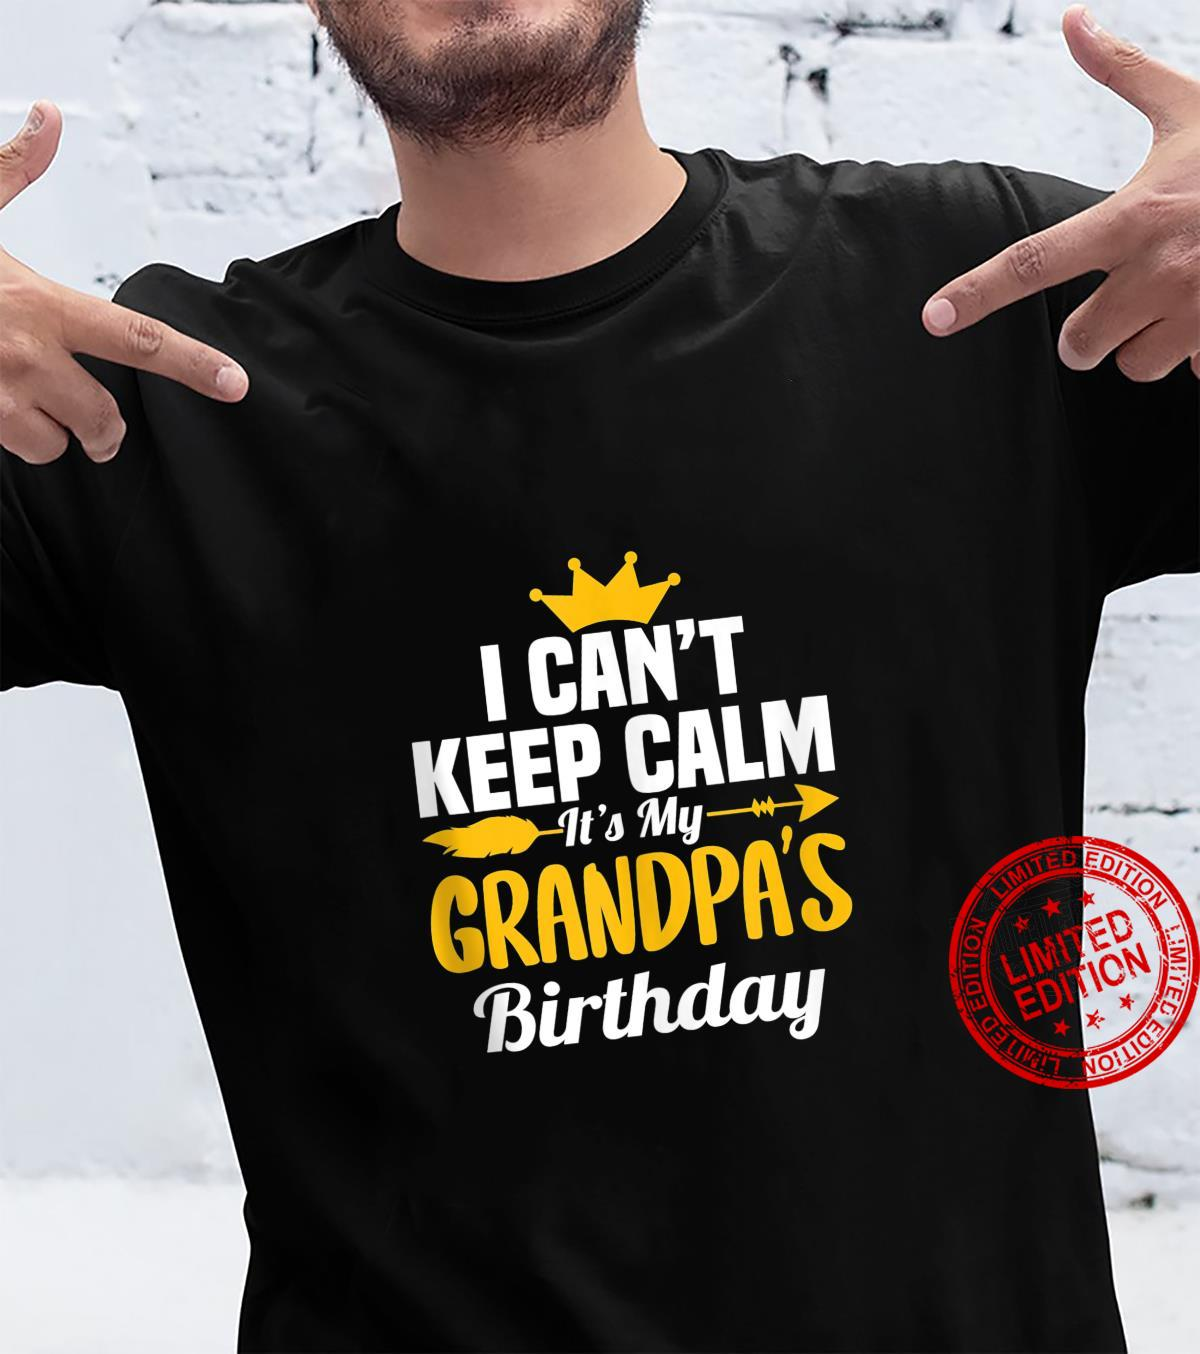 I Can't Keep Calm It's My Grandpa's Birthday Grandad Shirt